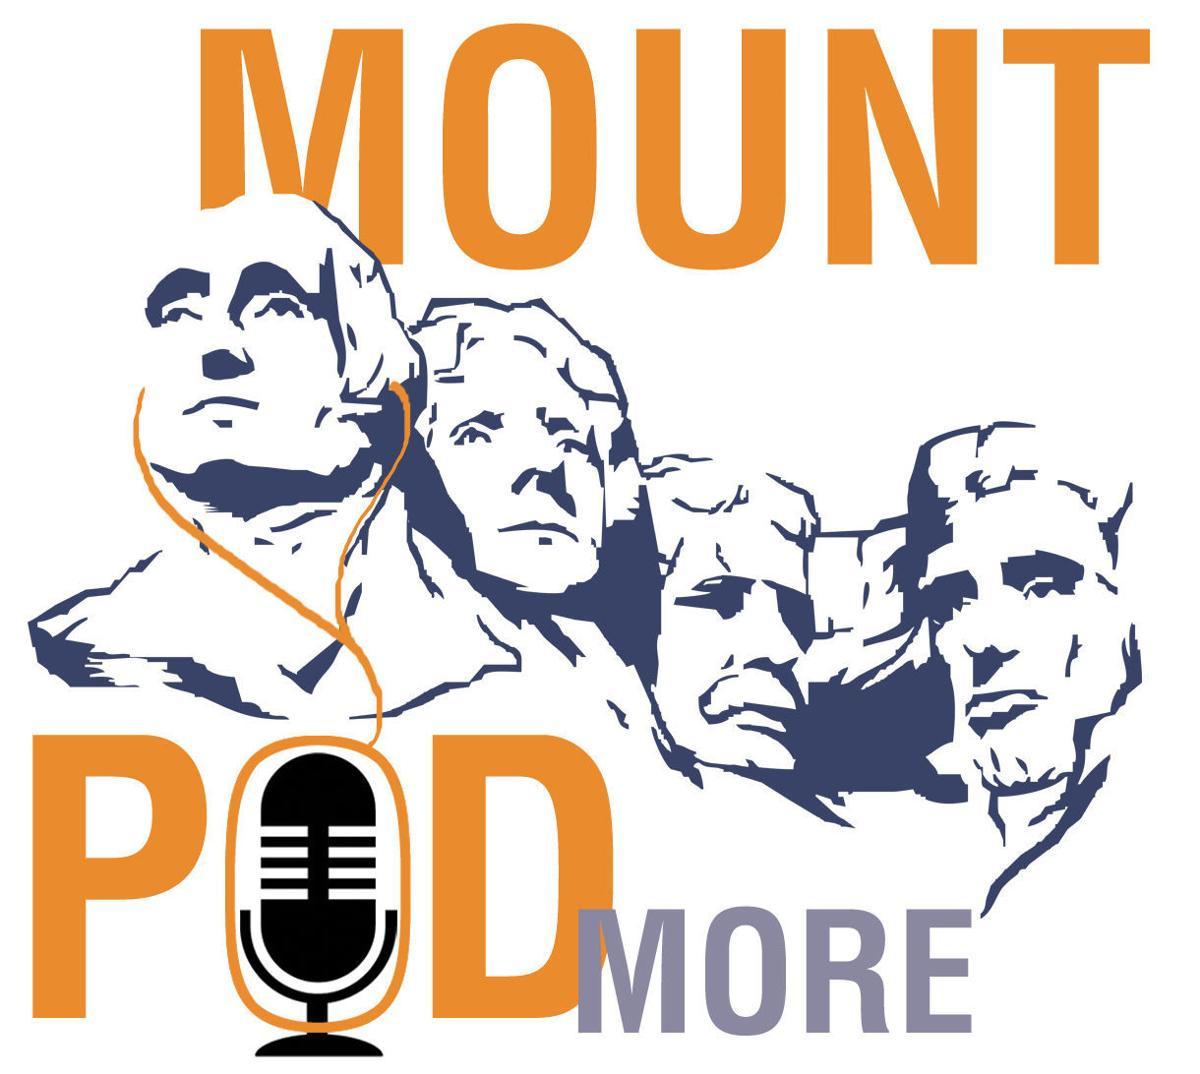 Mount Podmore